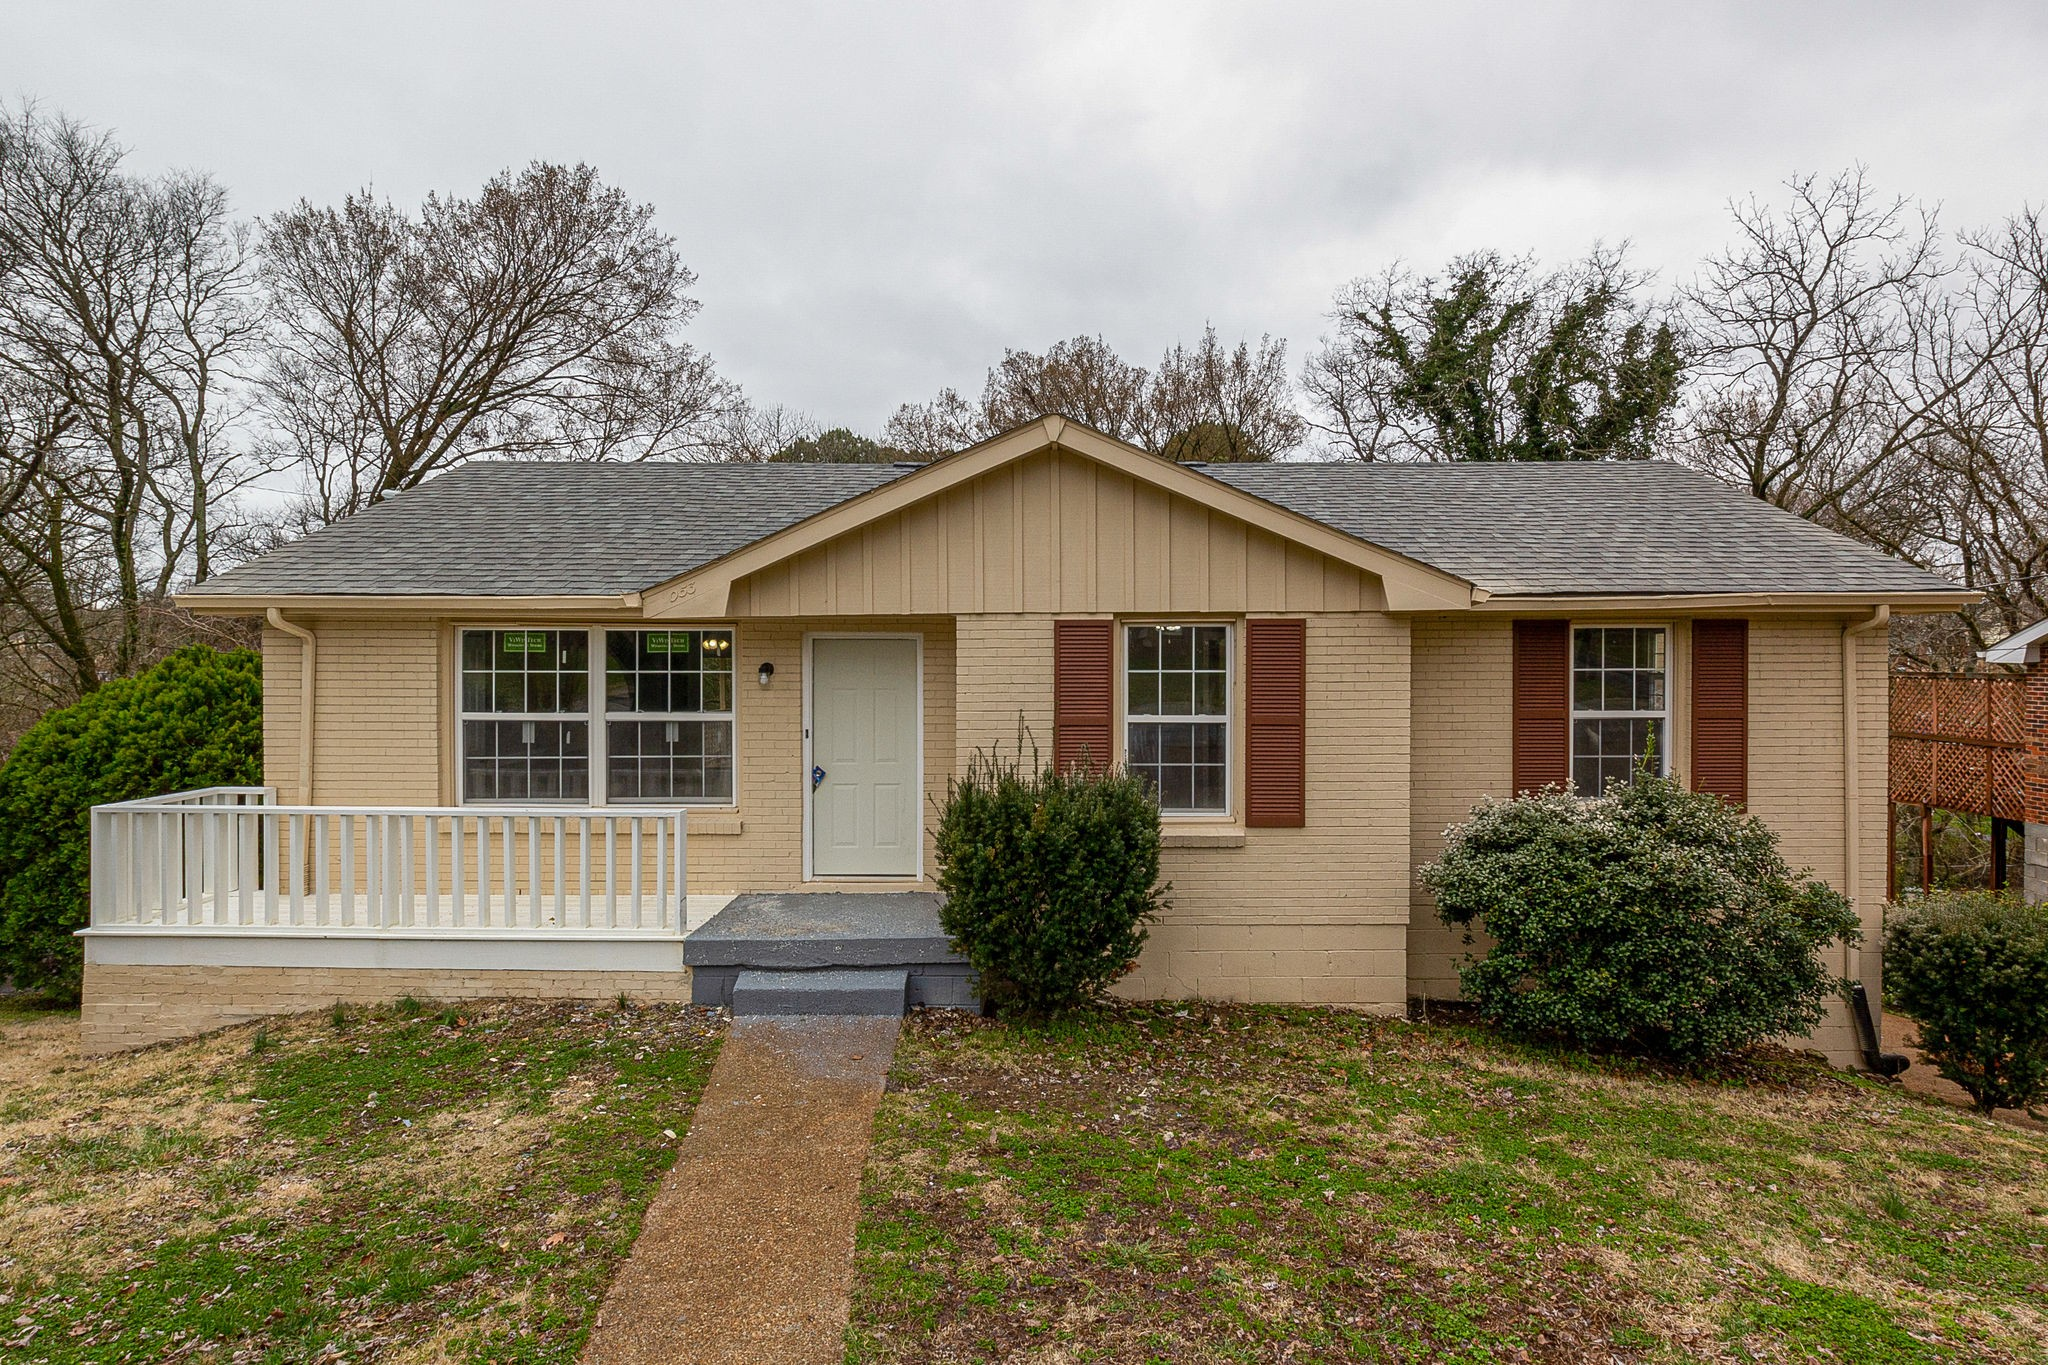 5053 McLendon Dr, Antioch, TN 37013 - Antioch, TN real estate listing